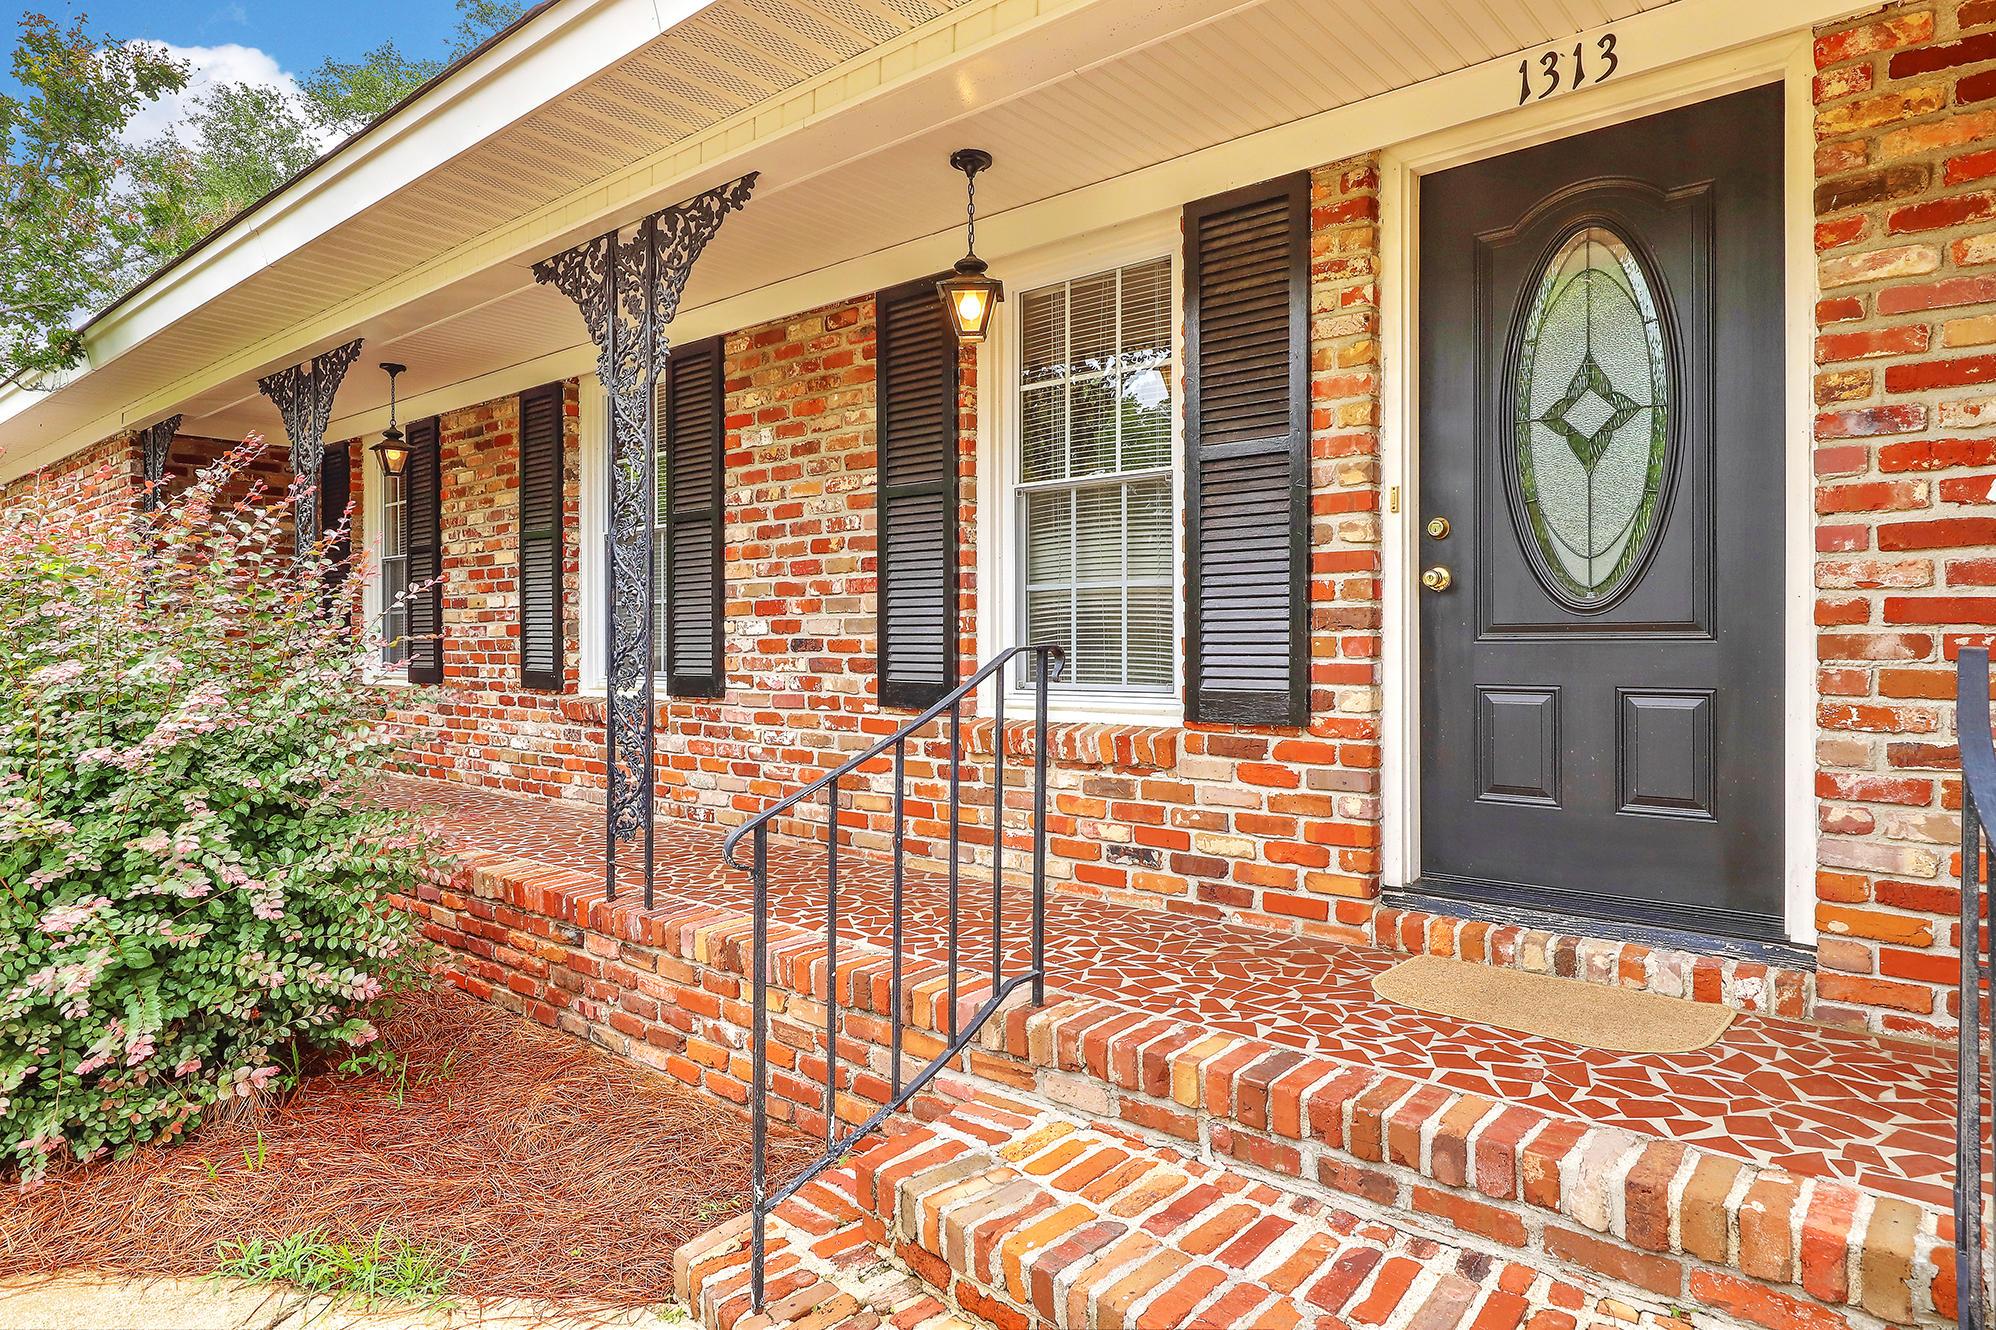 Charlestowne Estates III Homes For Sale - 1313 Coleridge, Charleston, SC - 6